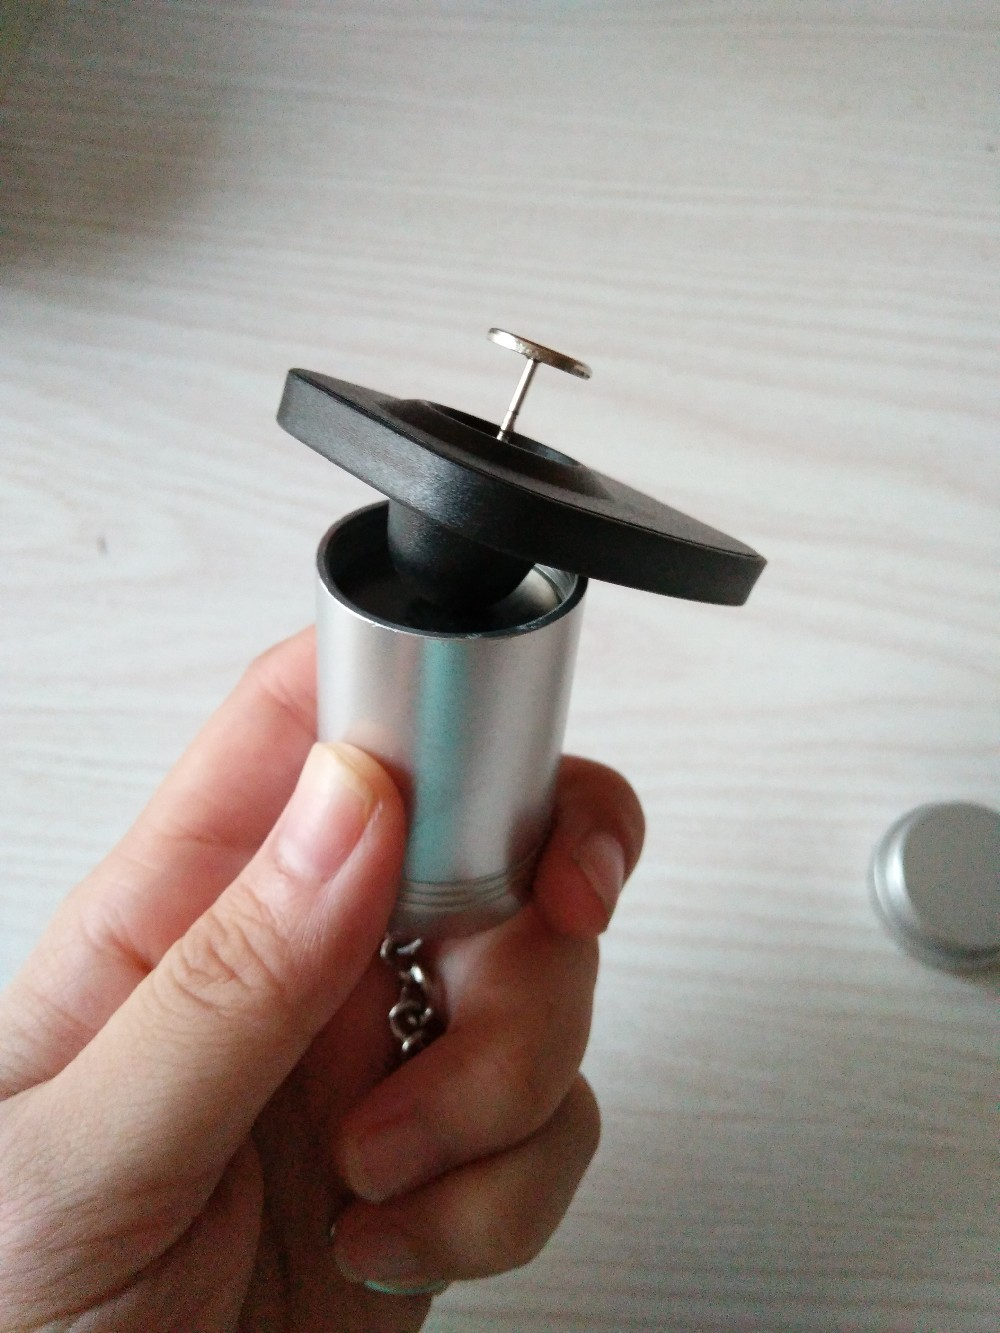 Portable magnet detacher key 12000gs Magnetic portable Bullet EAS Tag Detacher for Security Tag Hook Mini tag remover